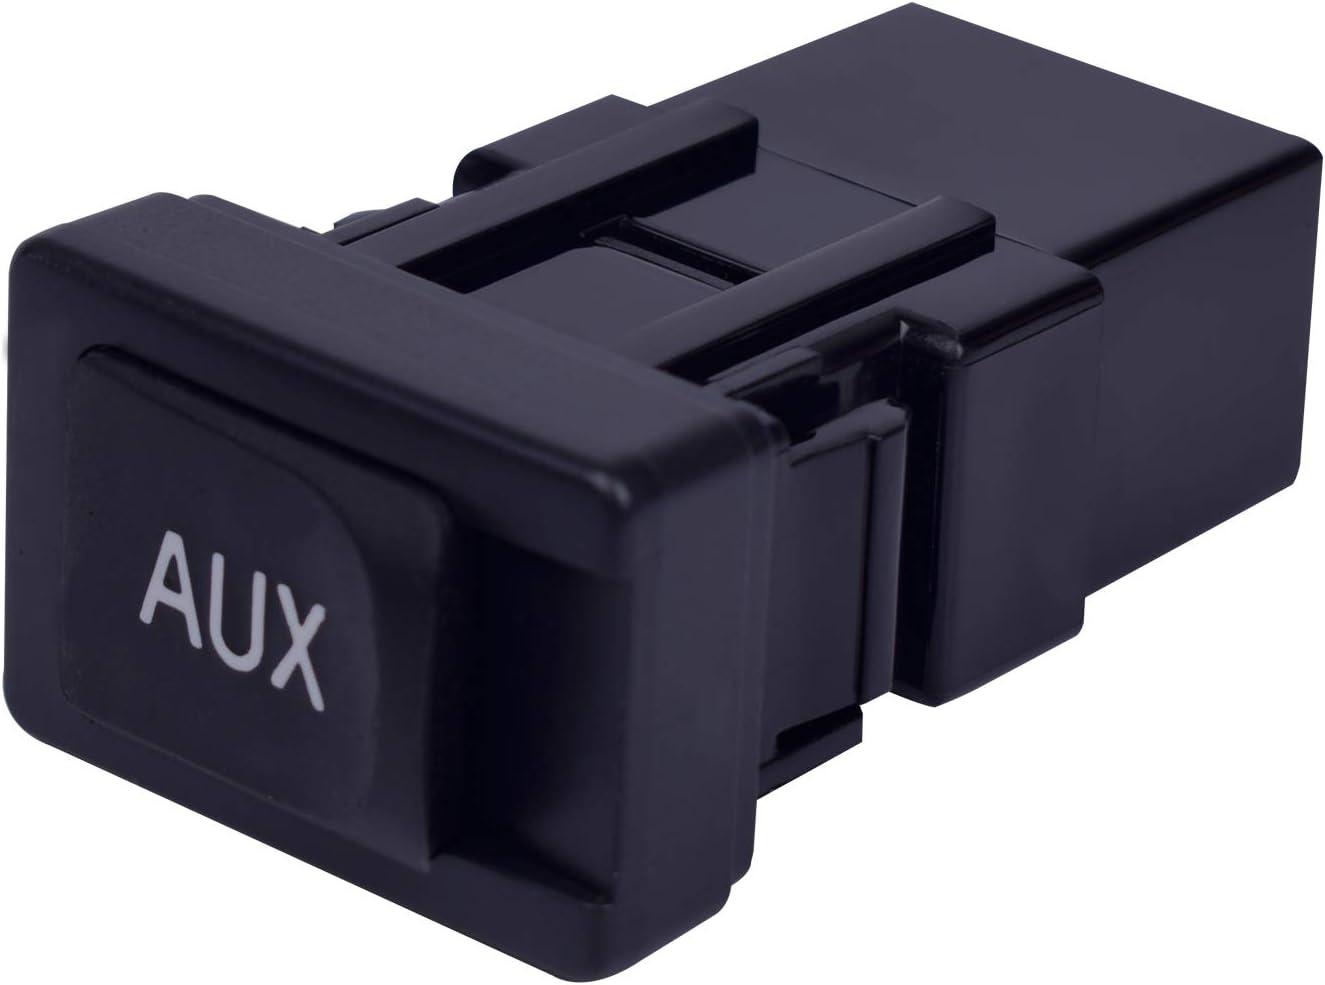 Reeoutdoor Auxiliary Input Jack Kit for 2005-2012 Toyota Prius, Yaris, FJ Cruiser, Lexus ES350 LS460 LS600h Aux Port Audio Video 86190-06010